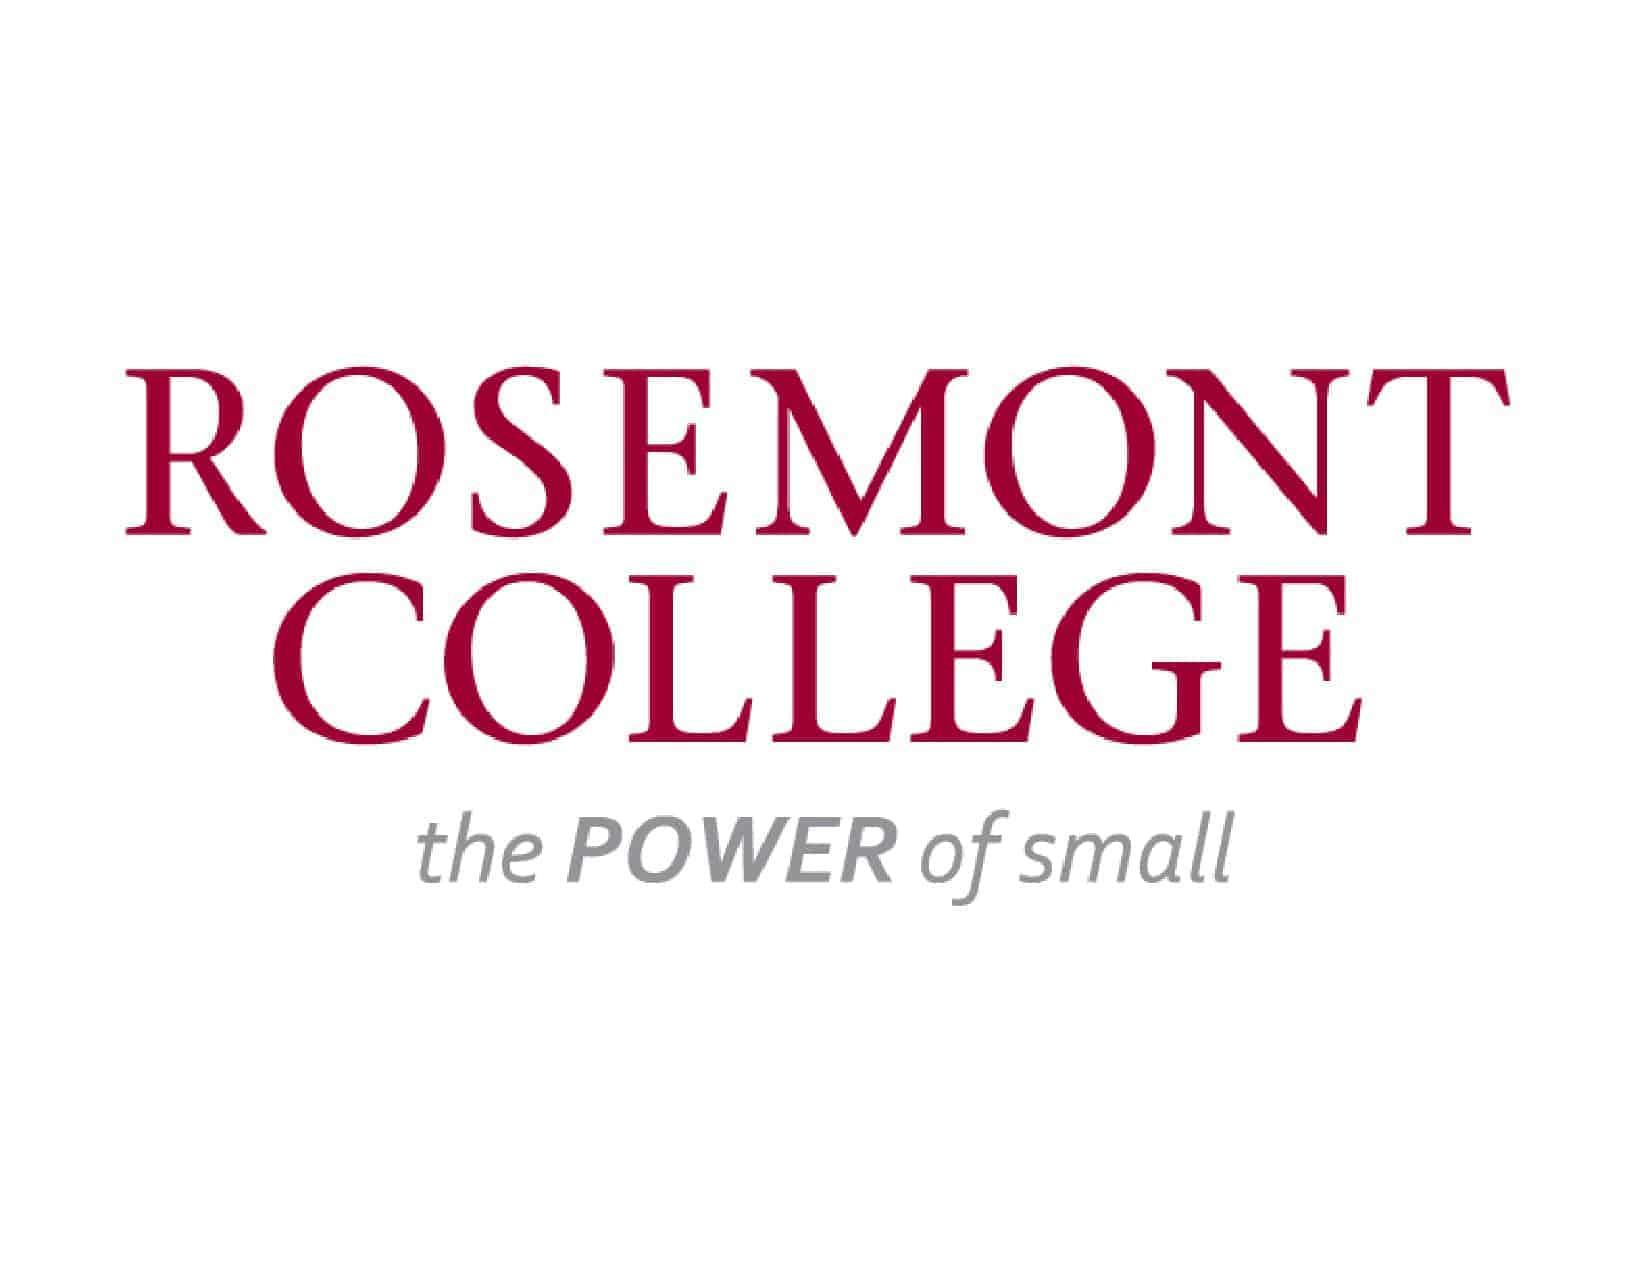 schools of graduate and professional studies rosemont college logo 46987